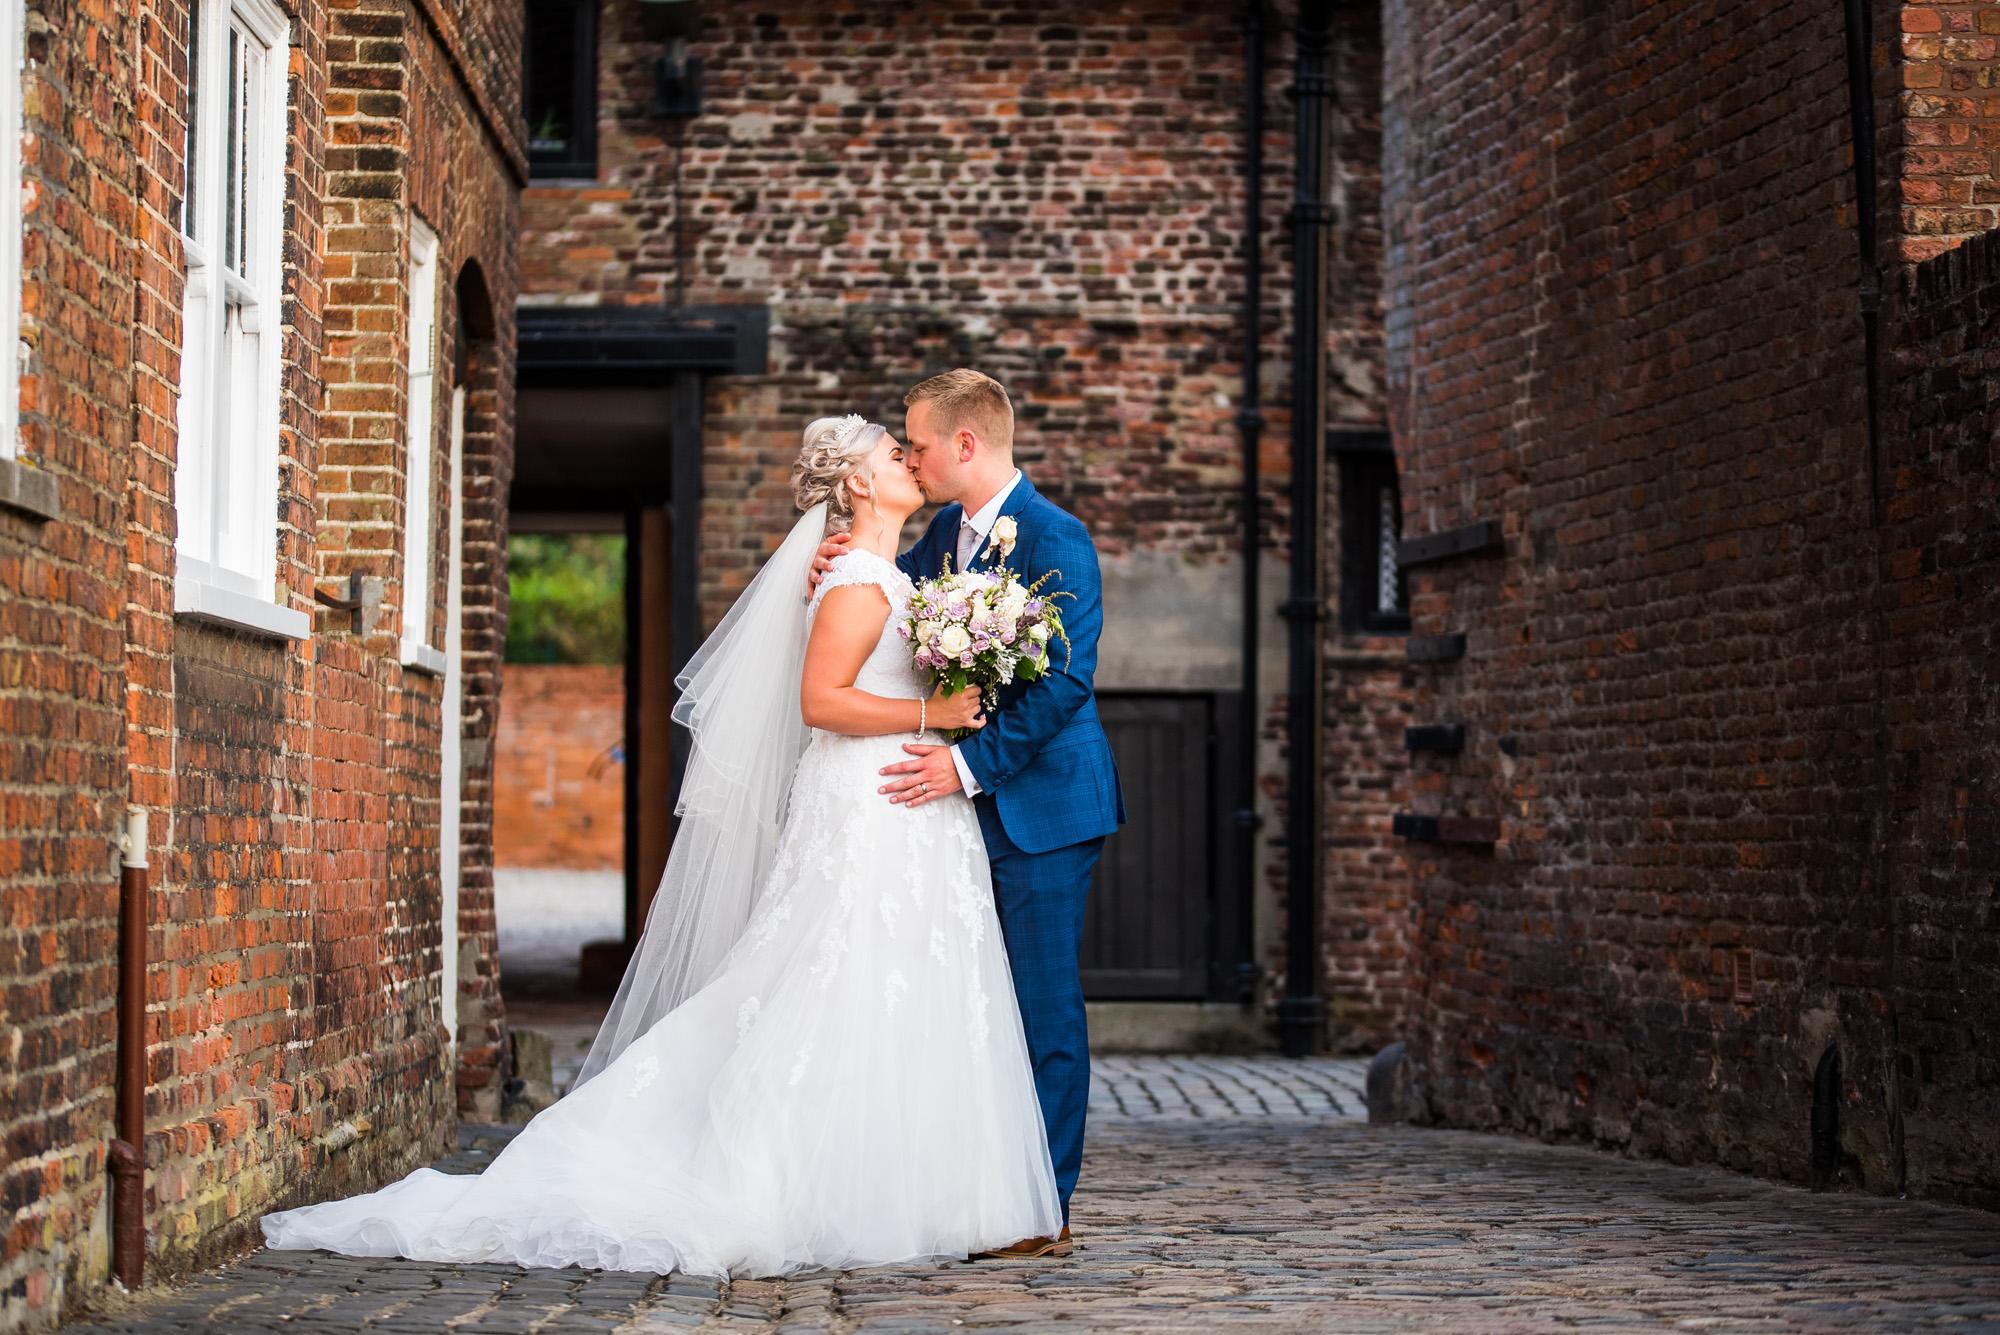 Savannah and Josh wedding photos (304 of 350).jpg